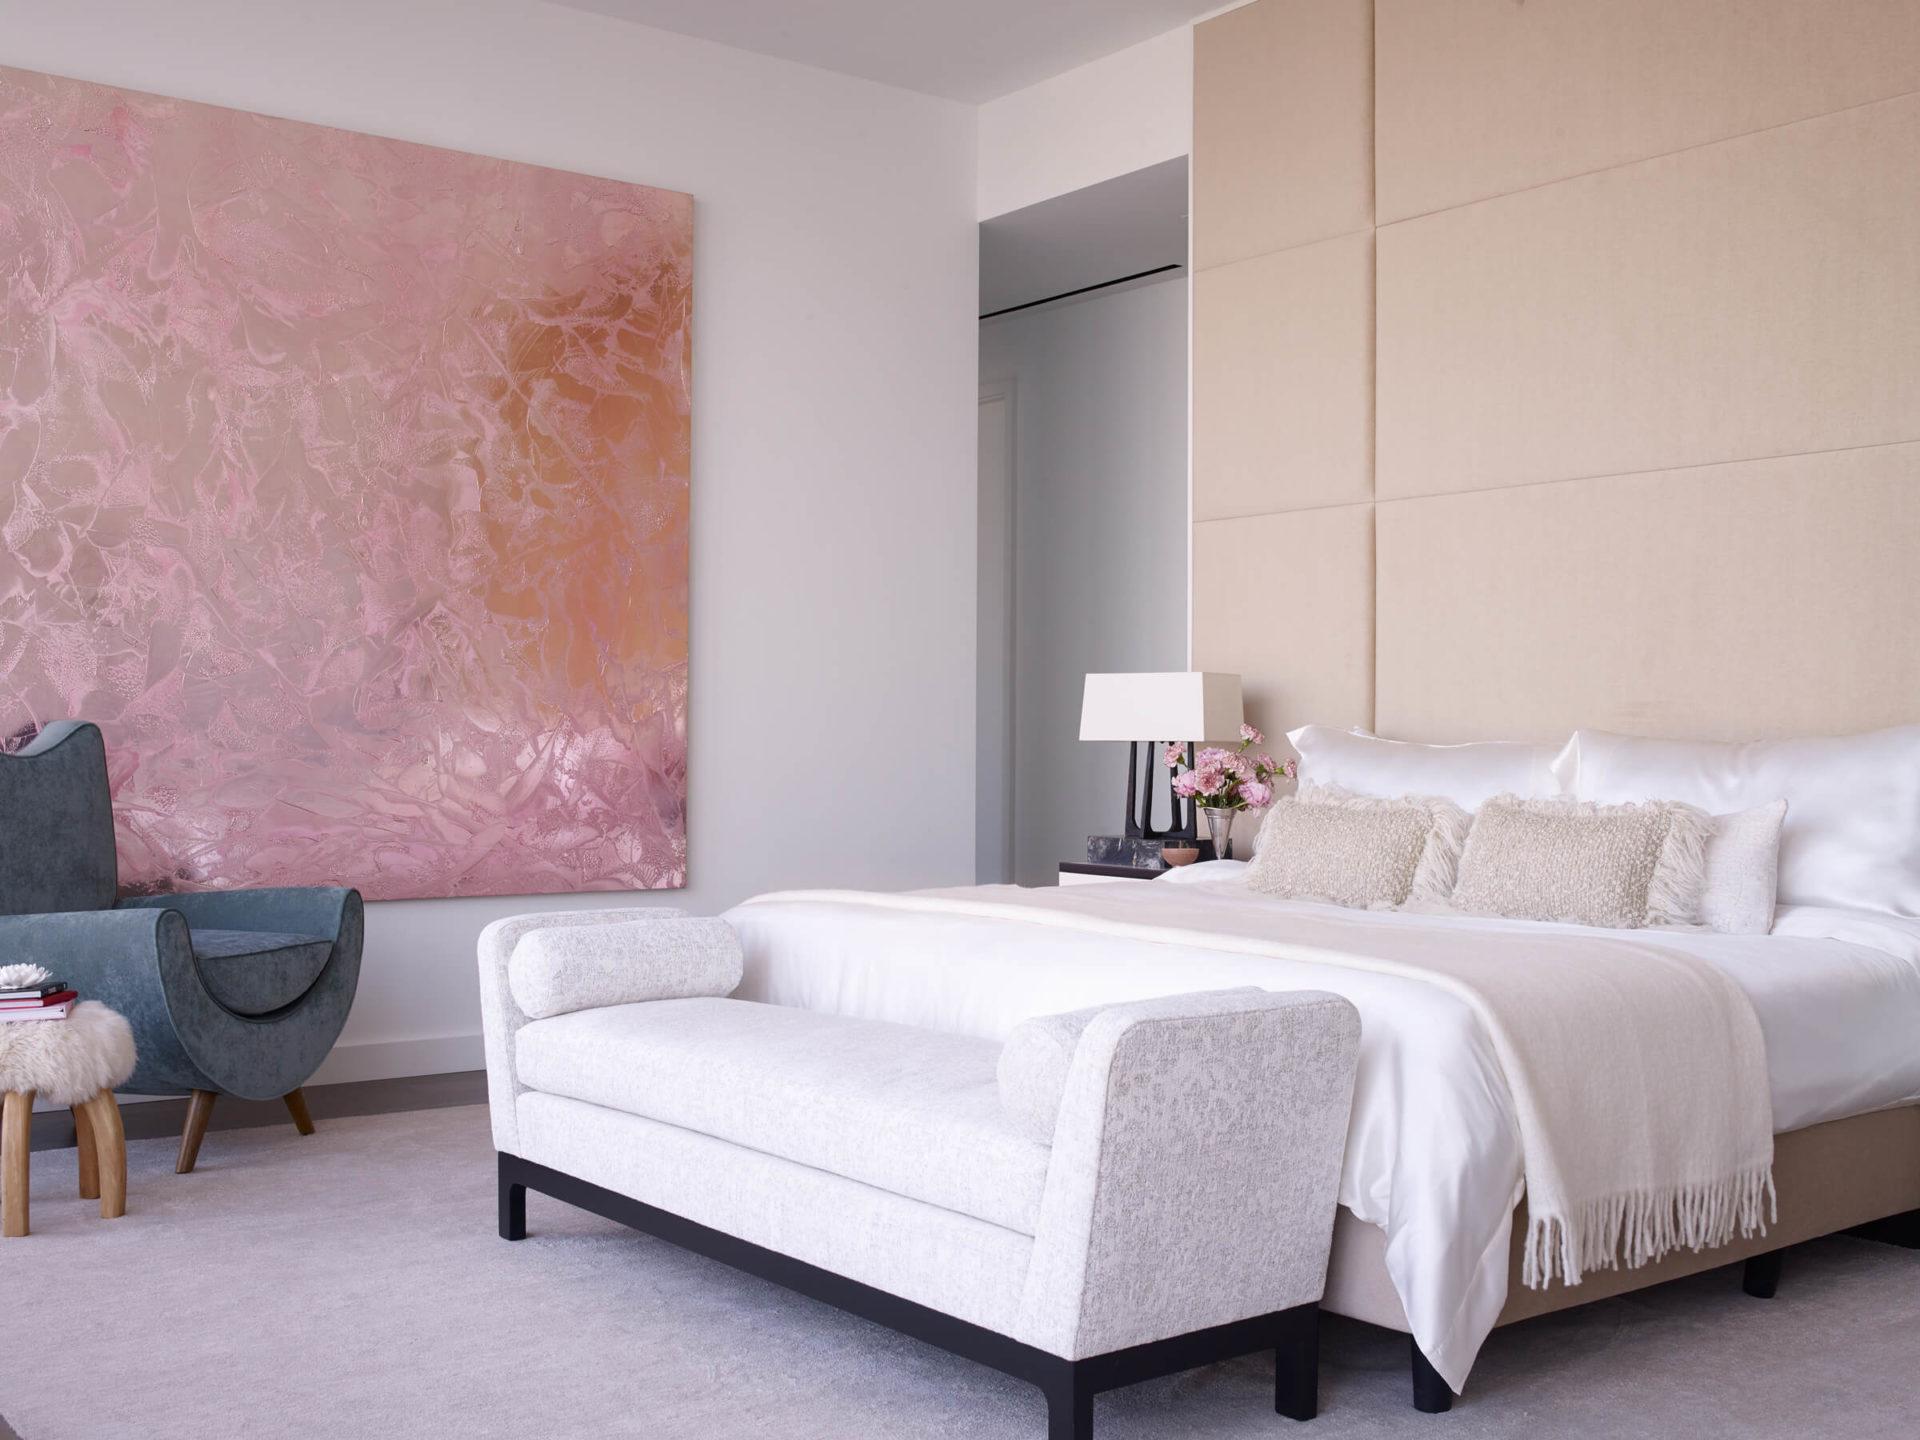 Nnicole-fuller-luxury-interior-designer-nyc-murry-project-S9_159